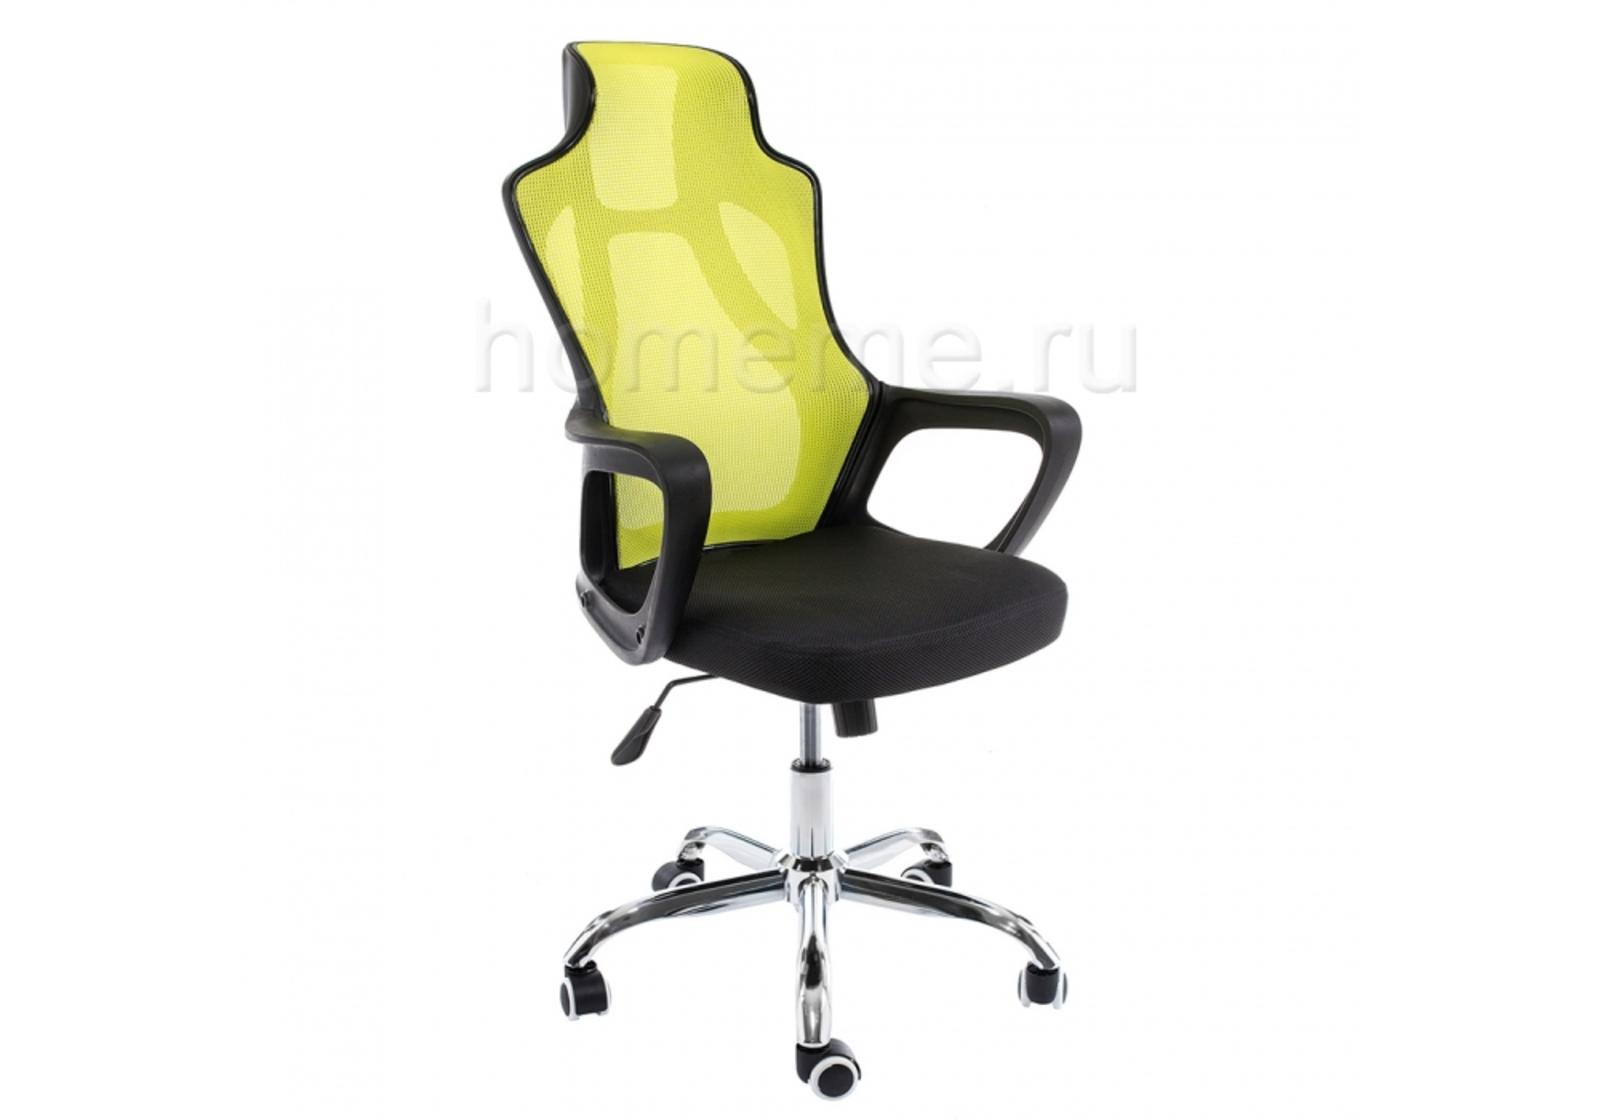 Кресло для офиса HomeMe Local черное / зеленое 1975 от Homeme.ru